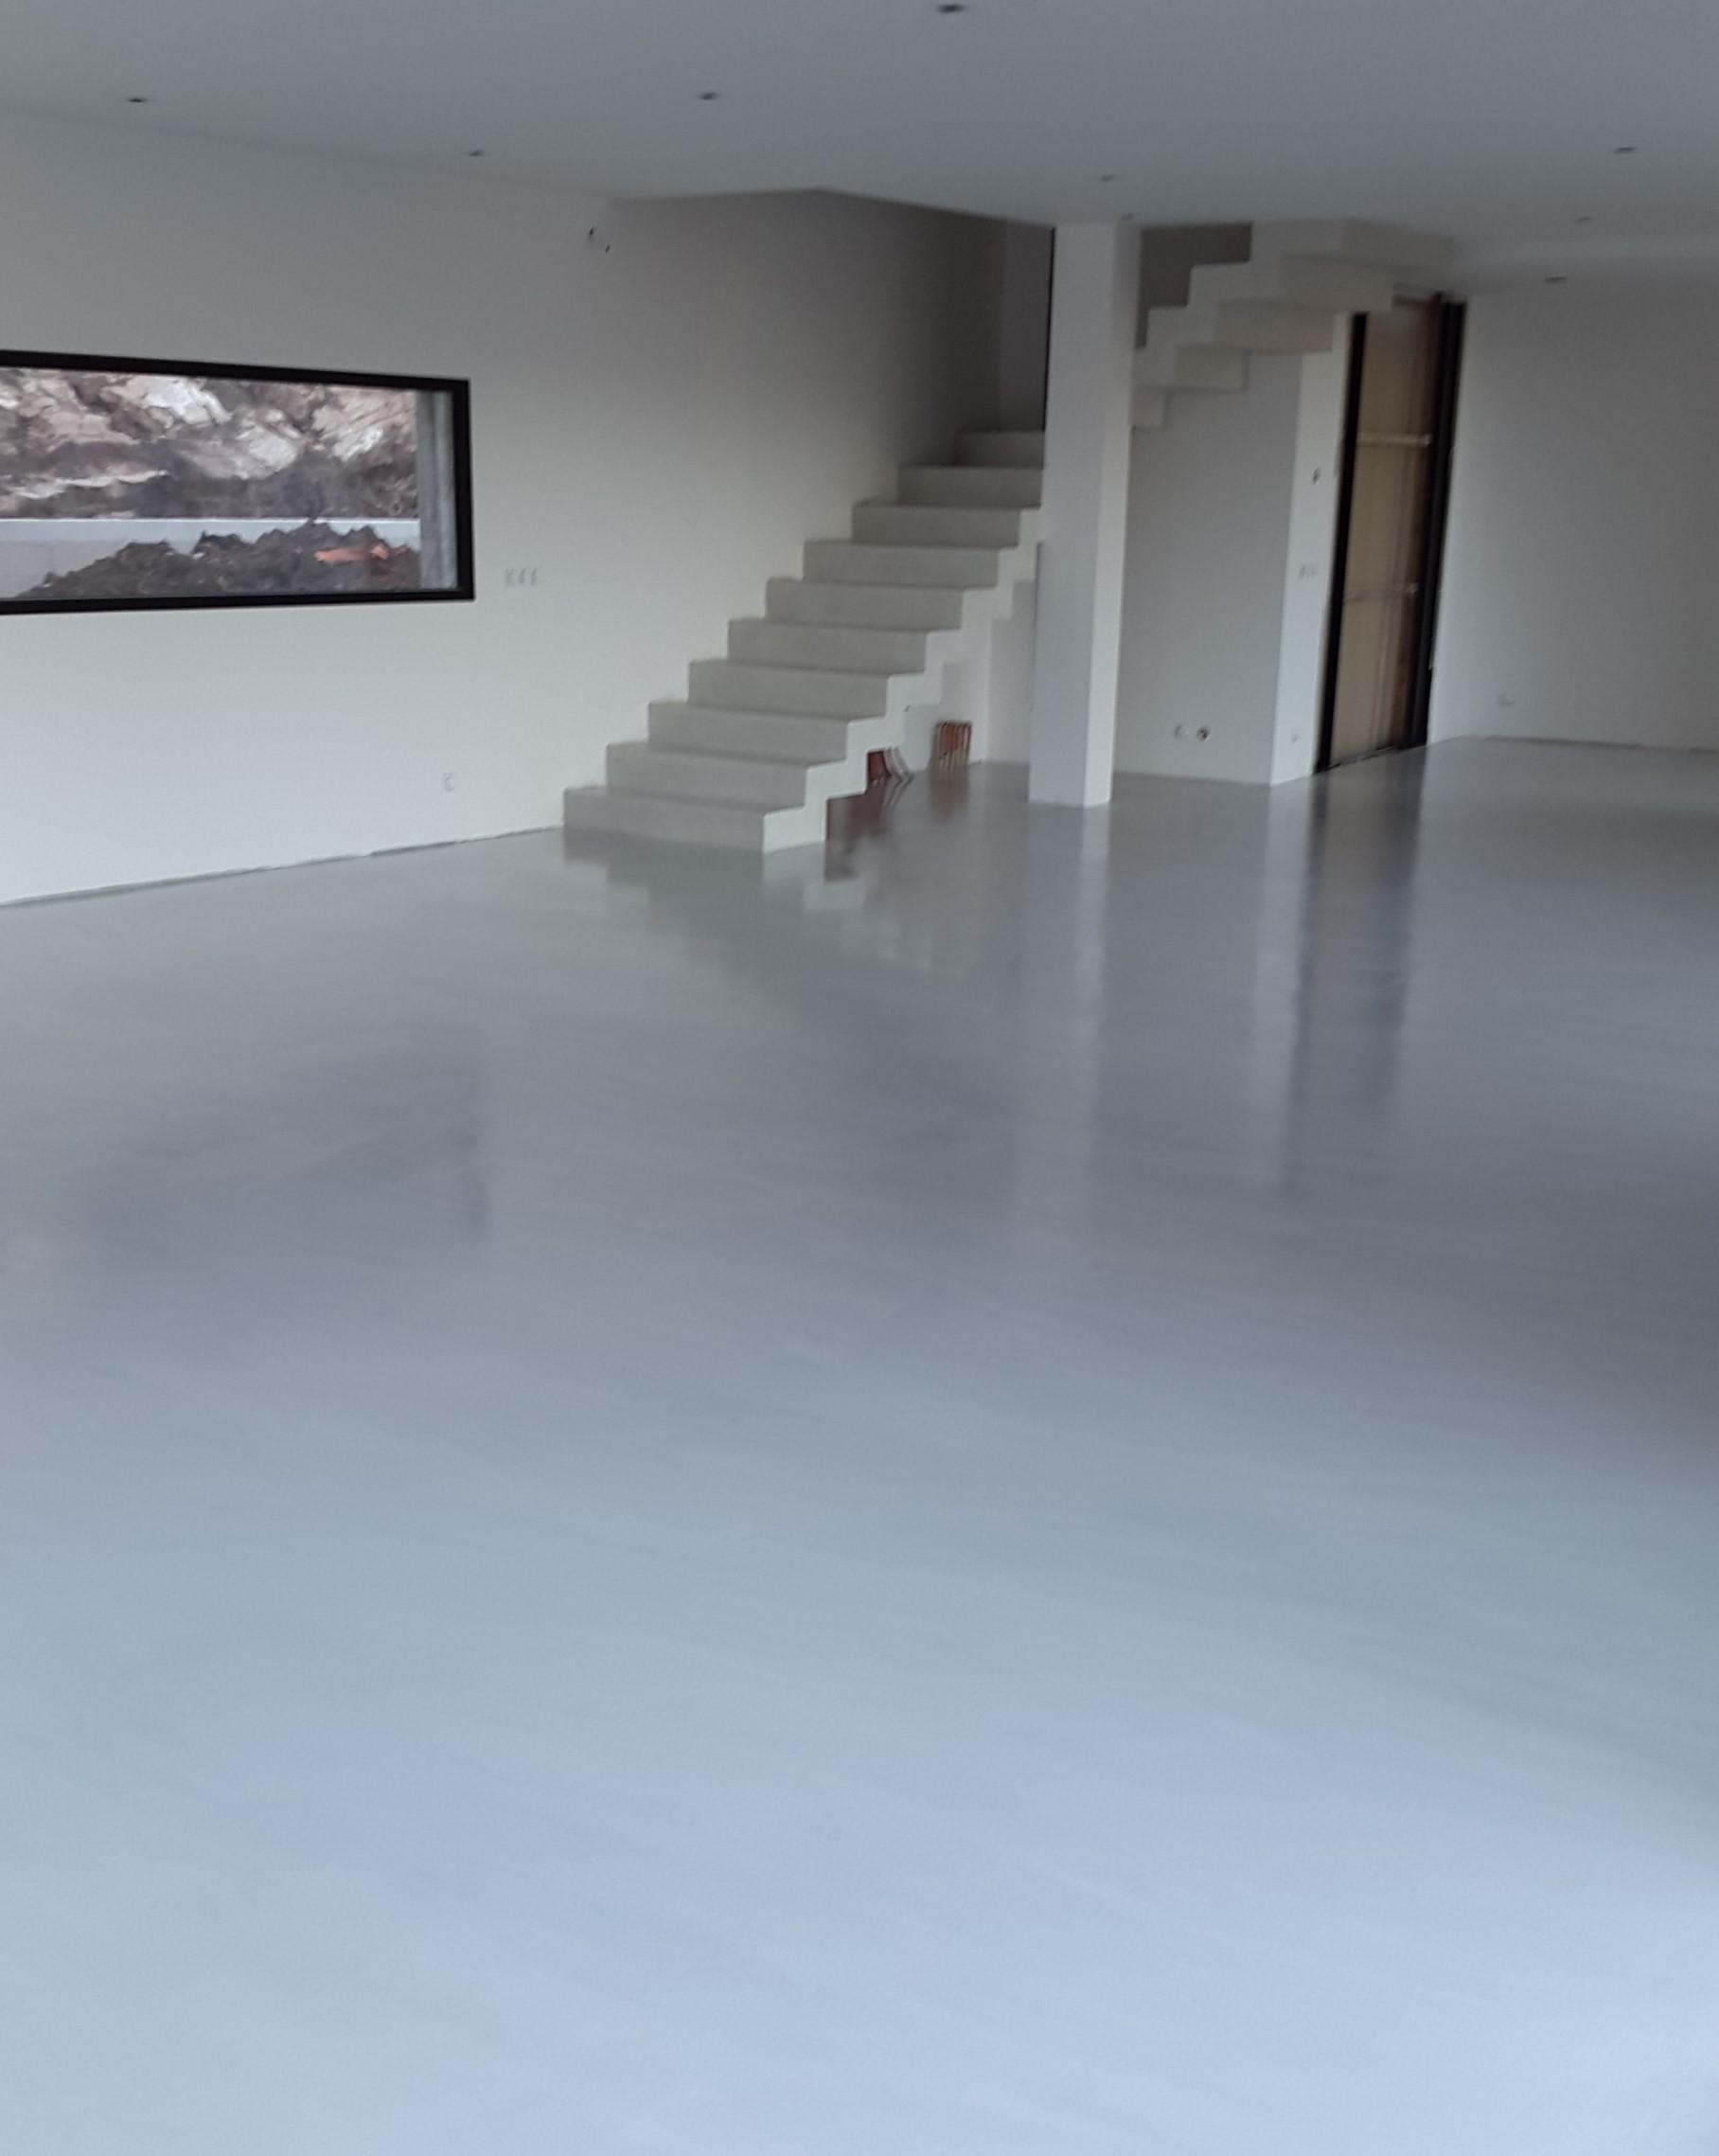 Fabricant Beton Cire France sols béton ciré montpellier hérault - cemia